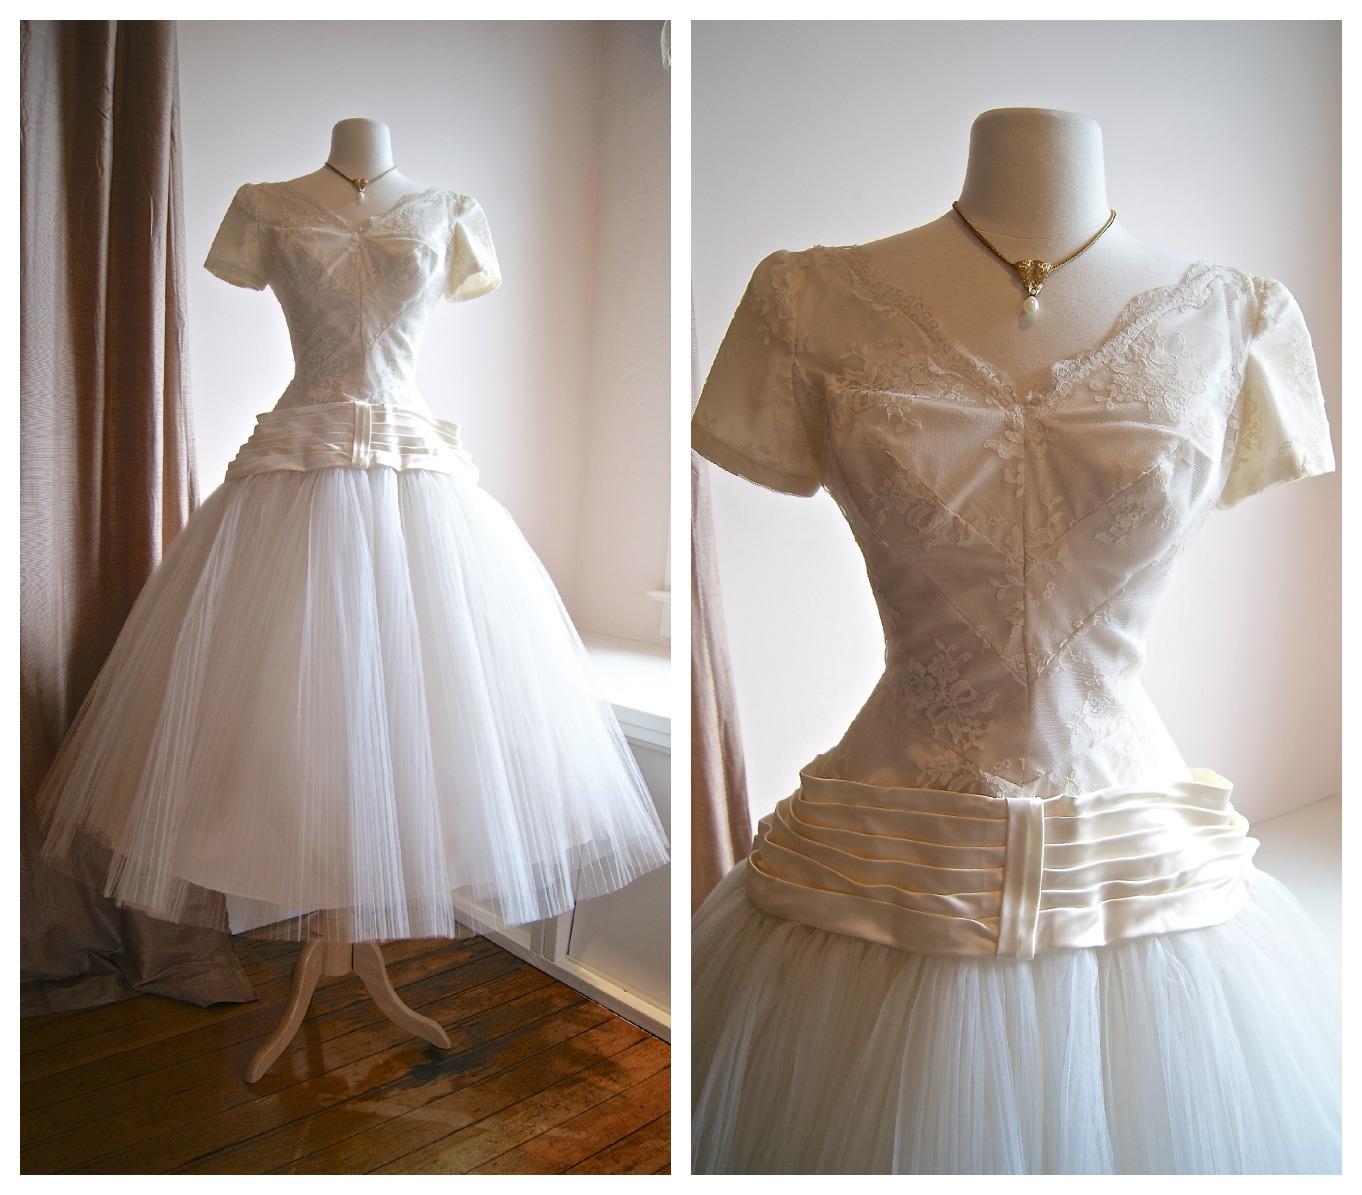 Vintage Wedding Dresses Boston: Xtabay Vintage Clothing Boutique